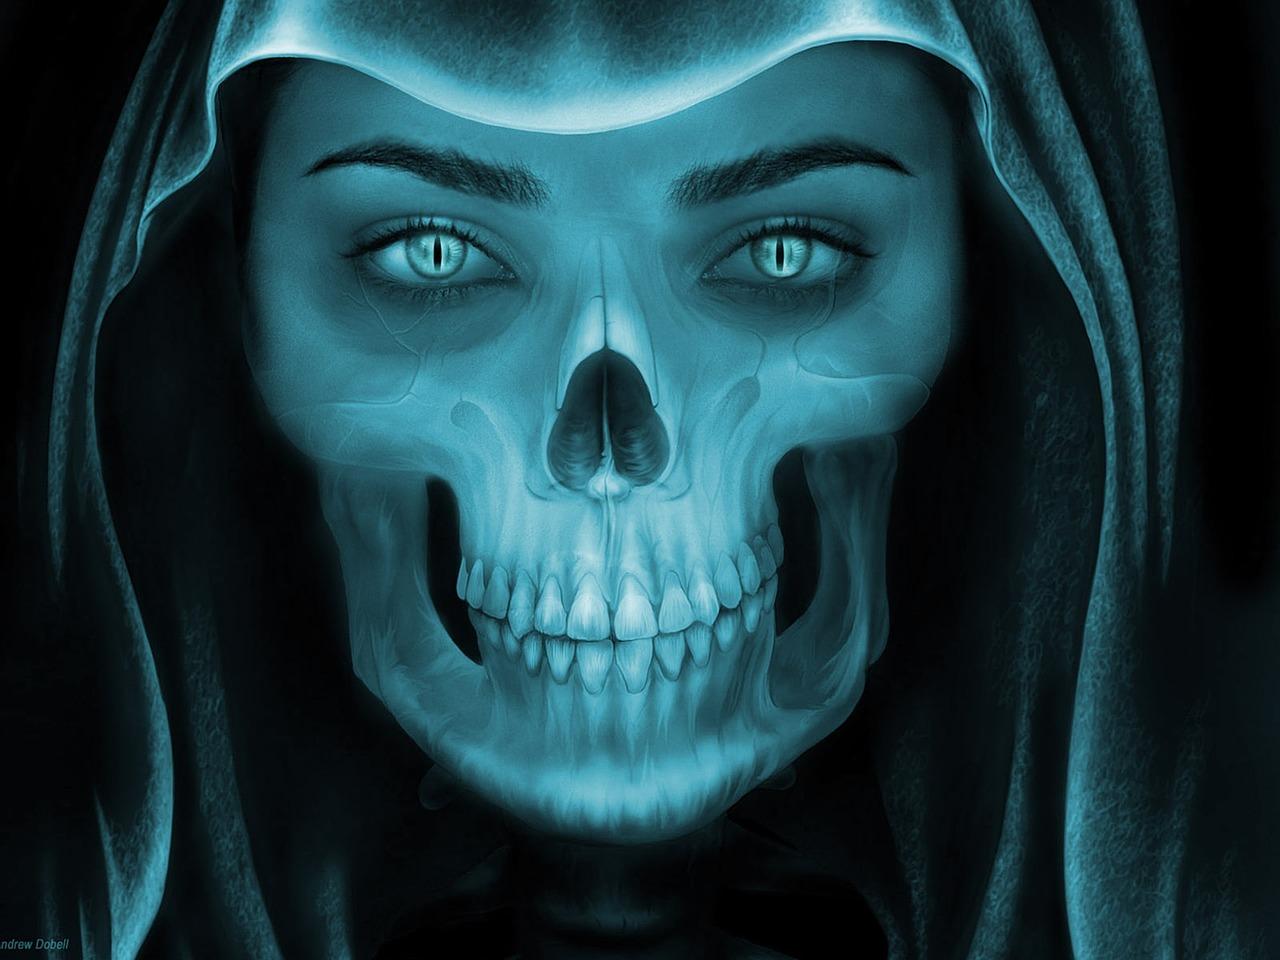 Chthonic deities, Underworld, Greek mythology, Retellings, Daughters of Zeus, young adult greek mythology retelling, Hades, Persephone ,Thanatos , The Judges,Cerberus, Charon, Cronus , Erinyes , Hecate, Hermes , Hypnos, Moirai,Nyx,Acheron , Arae, Ascalaphus ,Kakodaimones,Empusa ,Epiales , Erebus , Keres , Lamia , Lethe , Leuce, Melinoe ,Minthe,Mormolyceia (Mormos) , Oneiroi, Styx, Tartarus,Daira, Eurynomus, Gorgyra, Lampades, Cocytus, Macaria, Menoetes, Phlegethon, Trophonius,